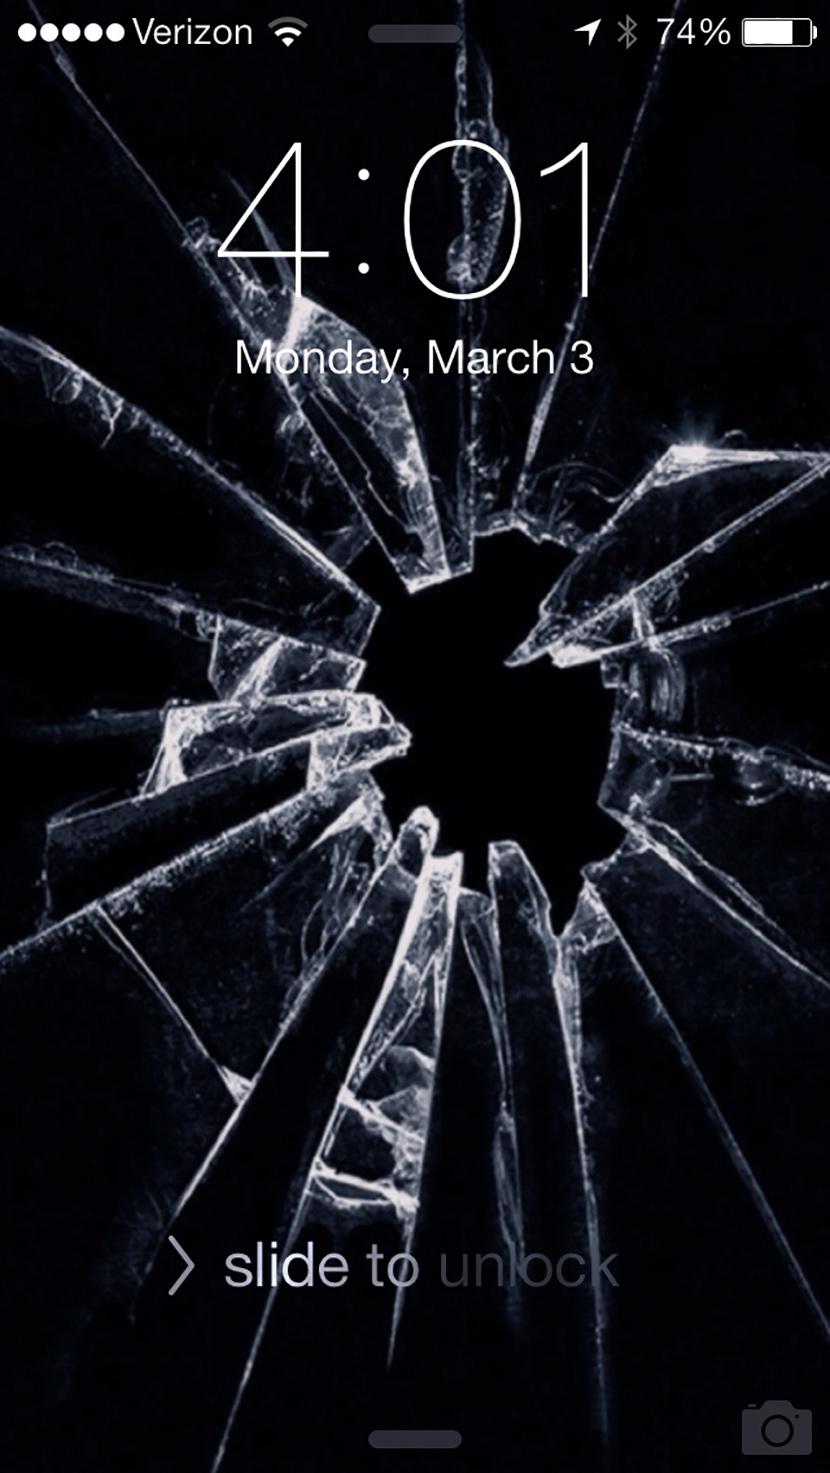 7 Broken Screen Wallpapers For Apple iPhone 5, 6 and 7 - Best